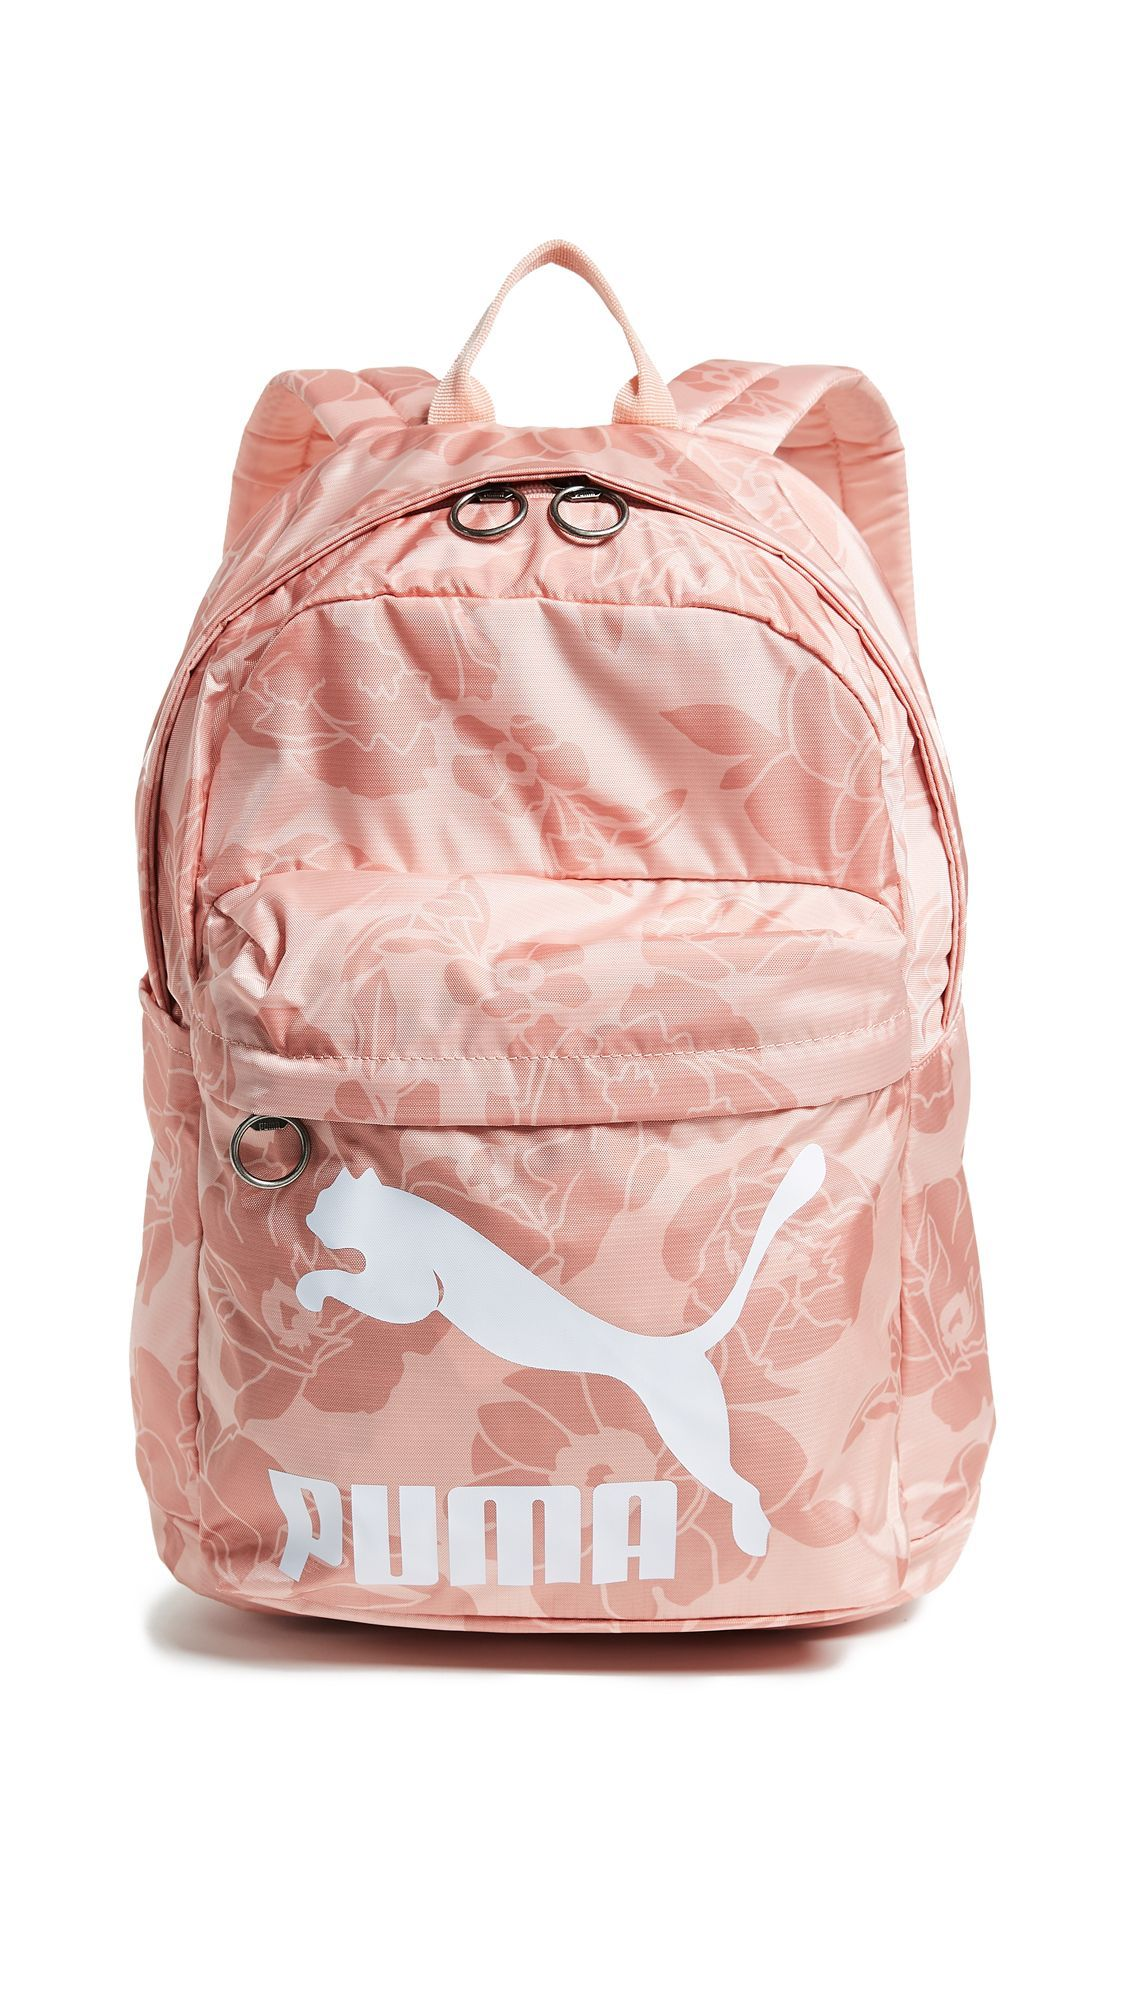 defb28aad4 PUMA ORIGINALS BACKPACK. #puma #bags #nylon #backpacks #  #trendyfashionbackpacks